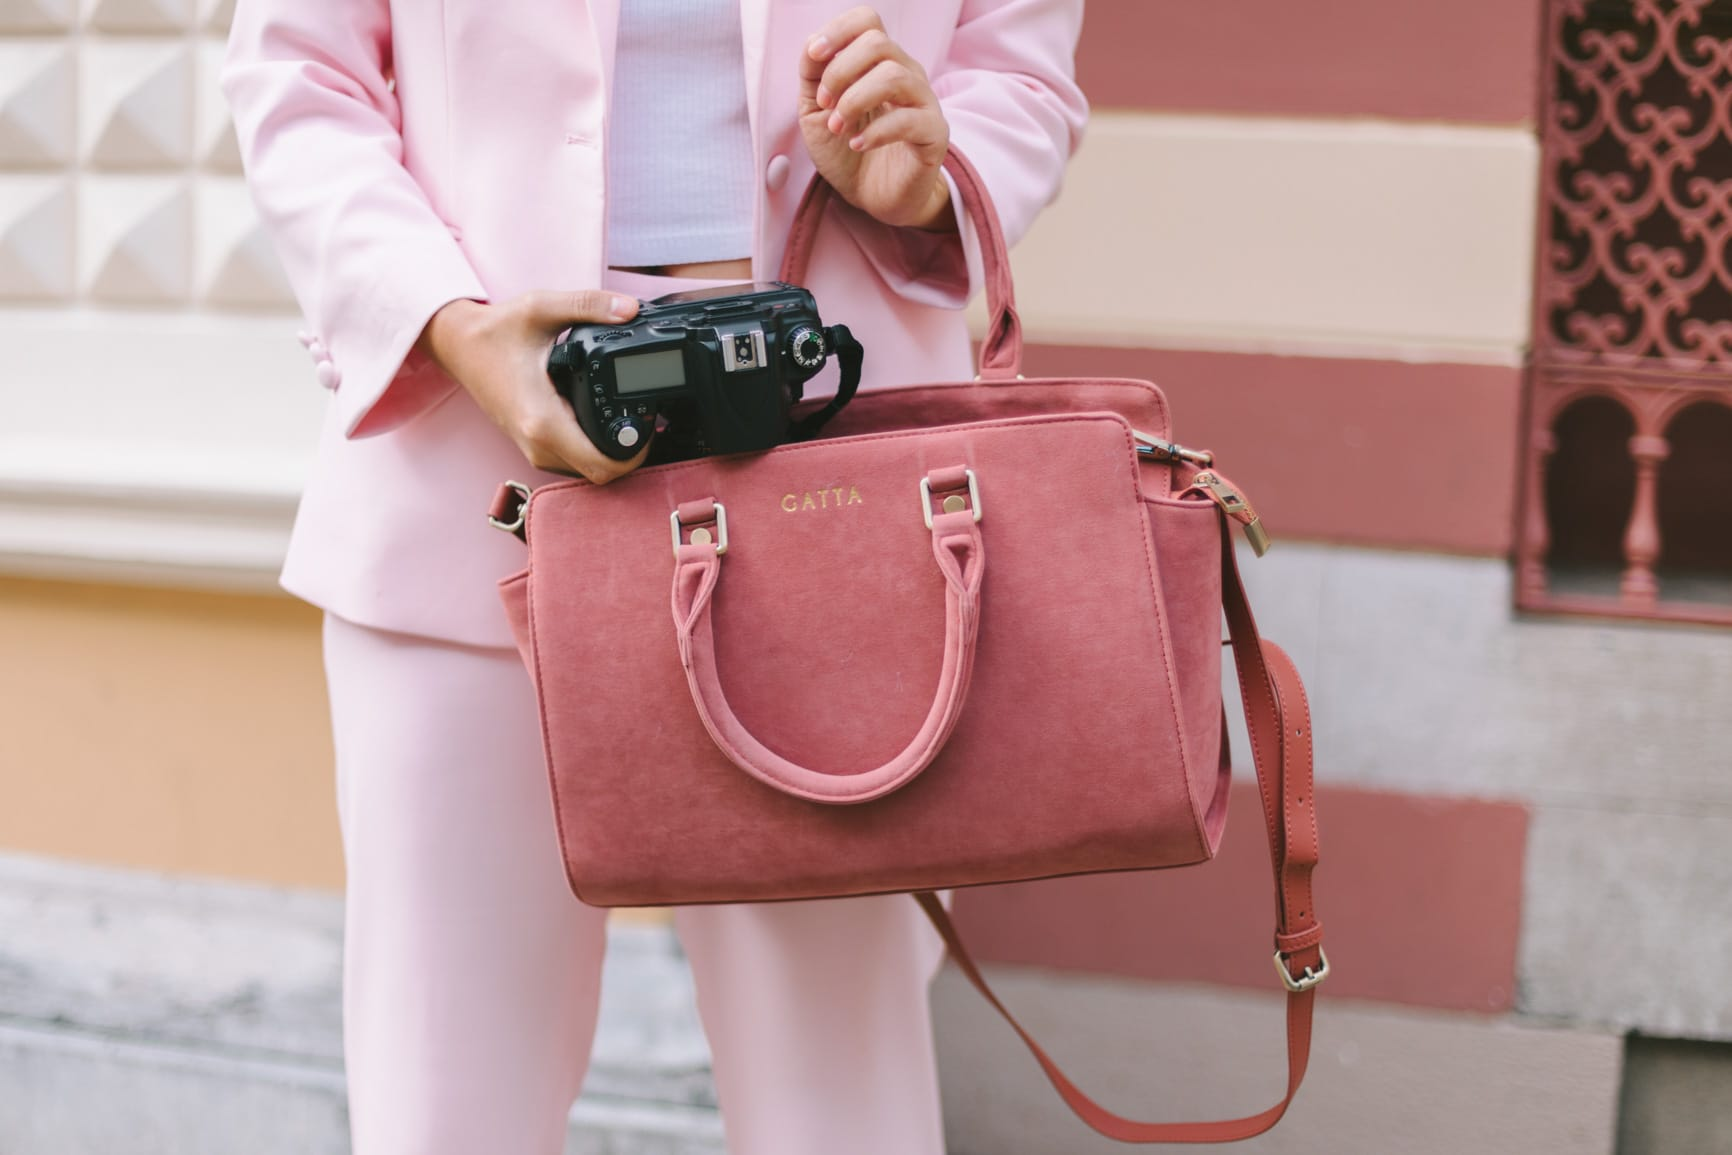 gatta stylish camera purse